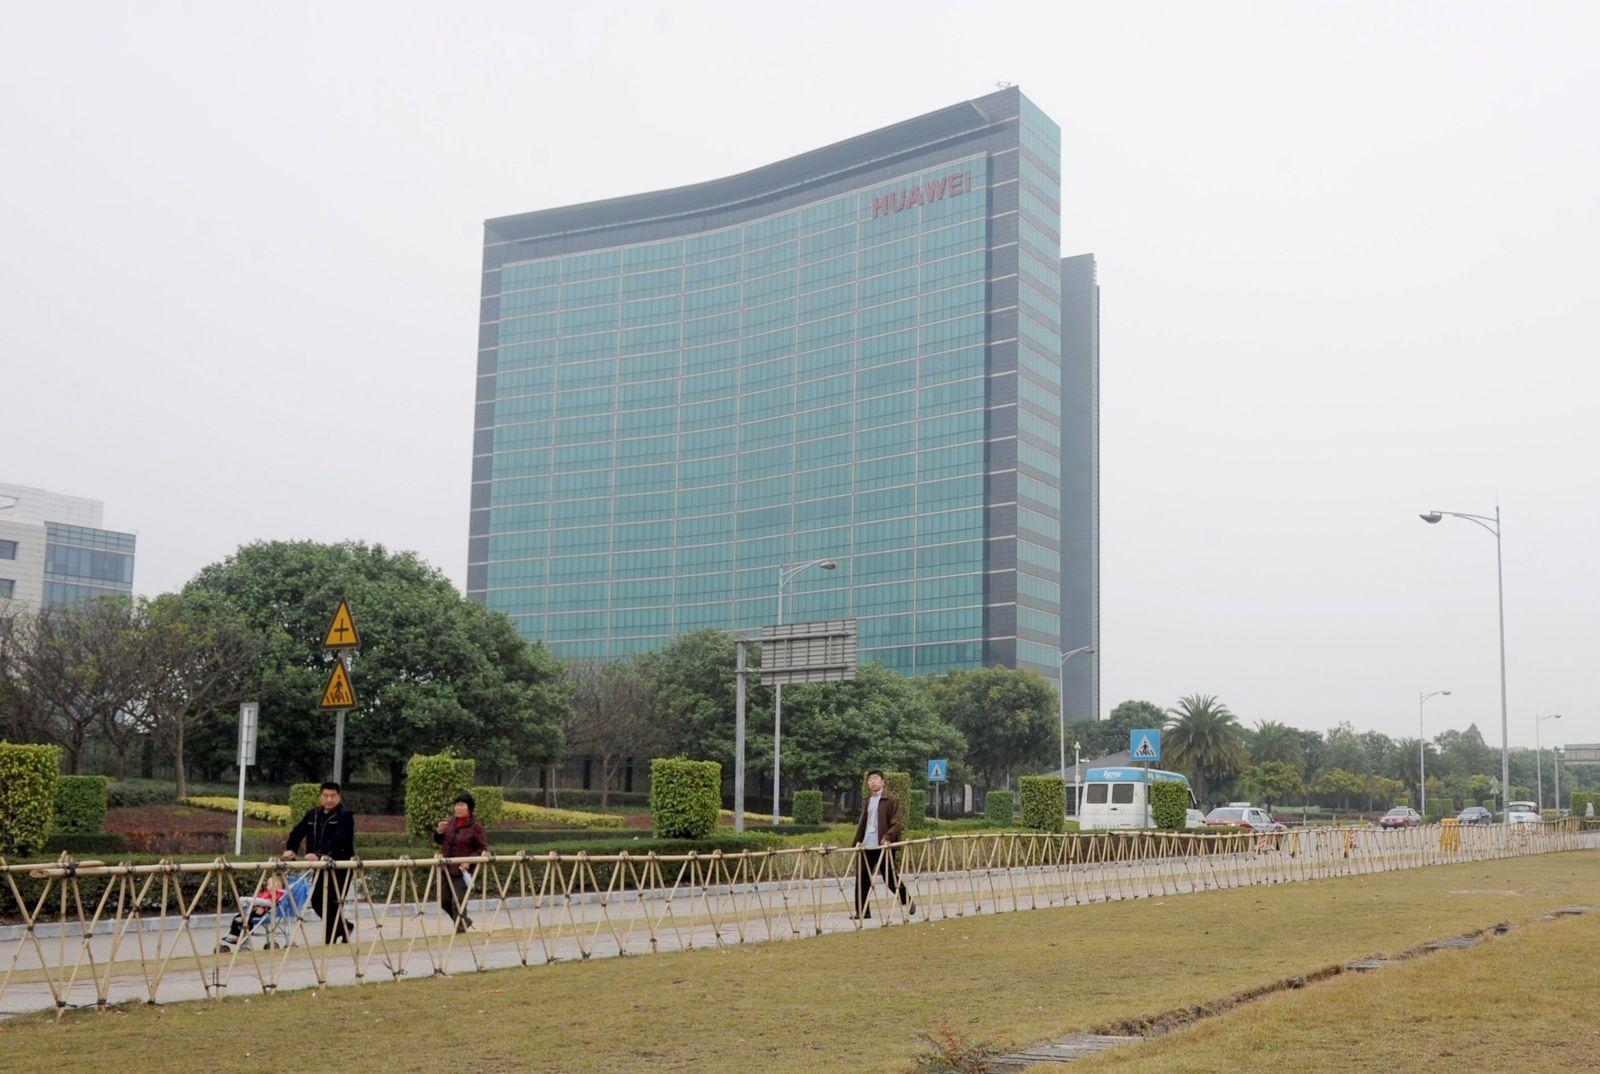 Huawei Zentrale / Hauptquartier in Shenzen